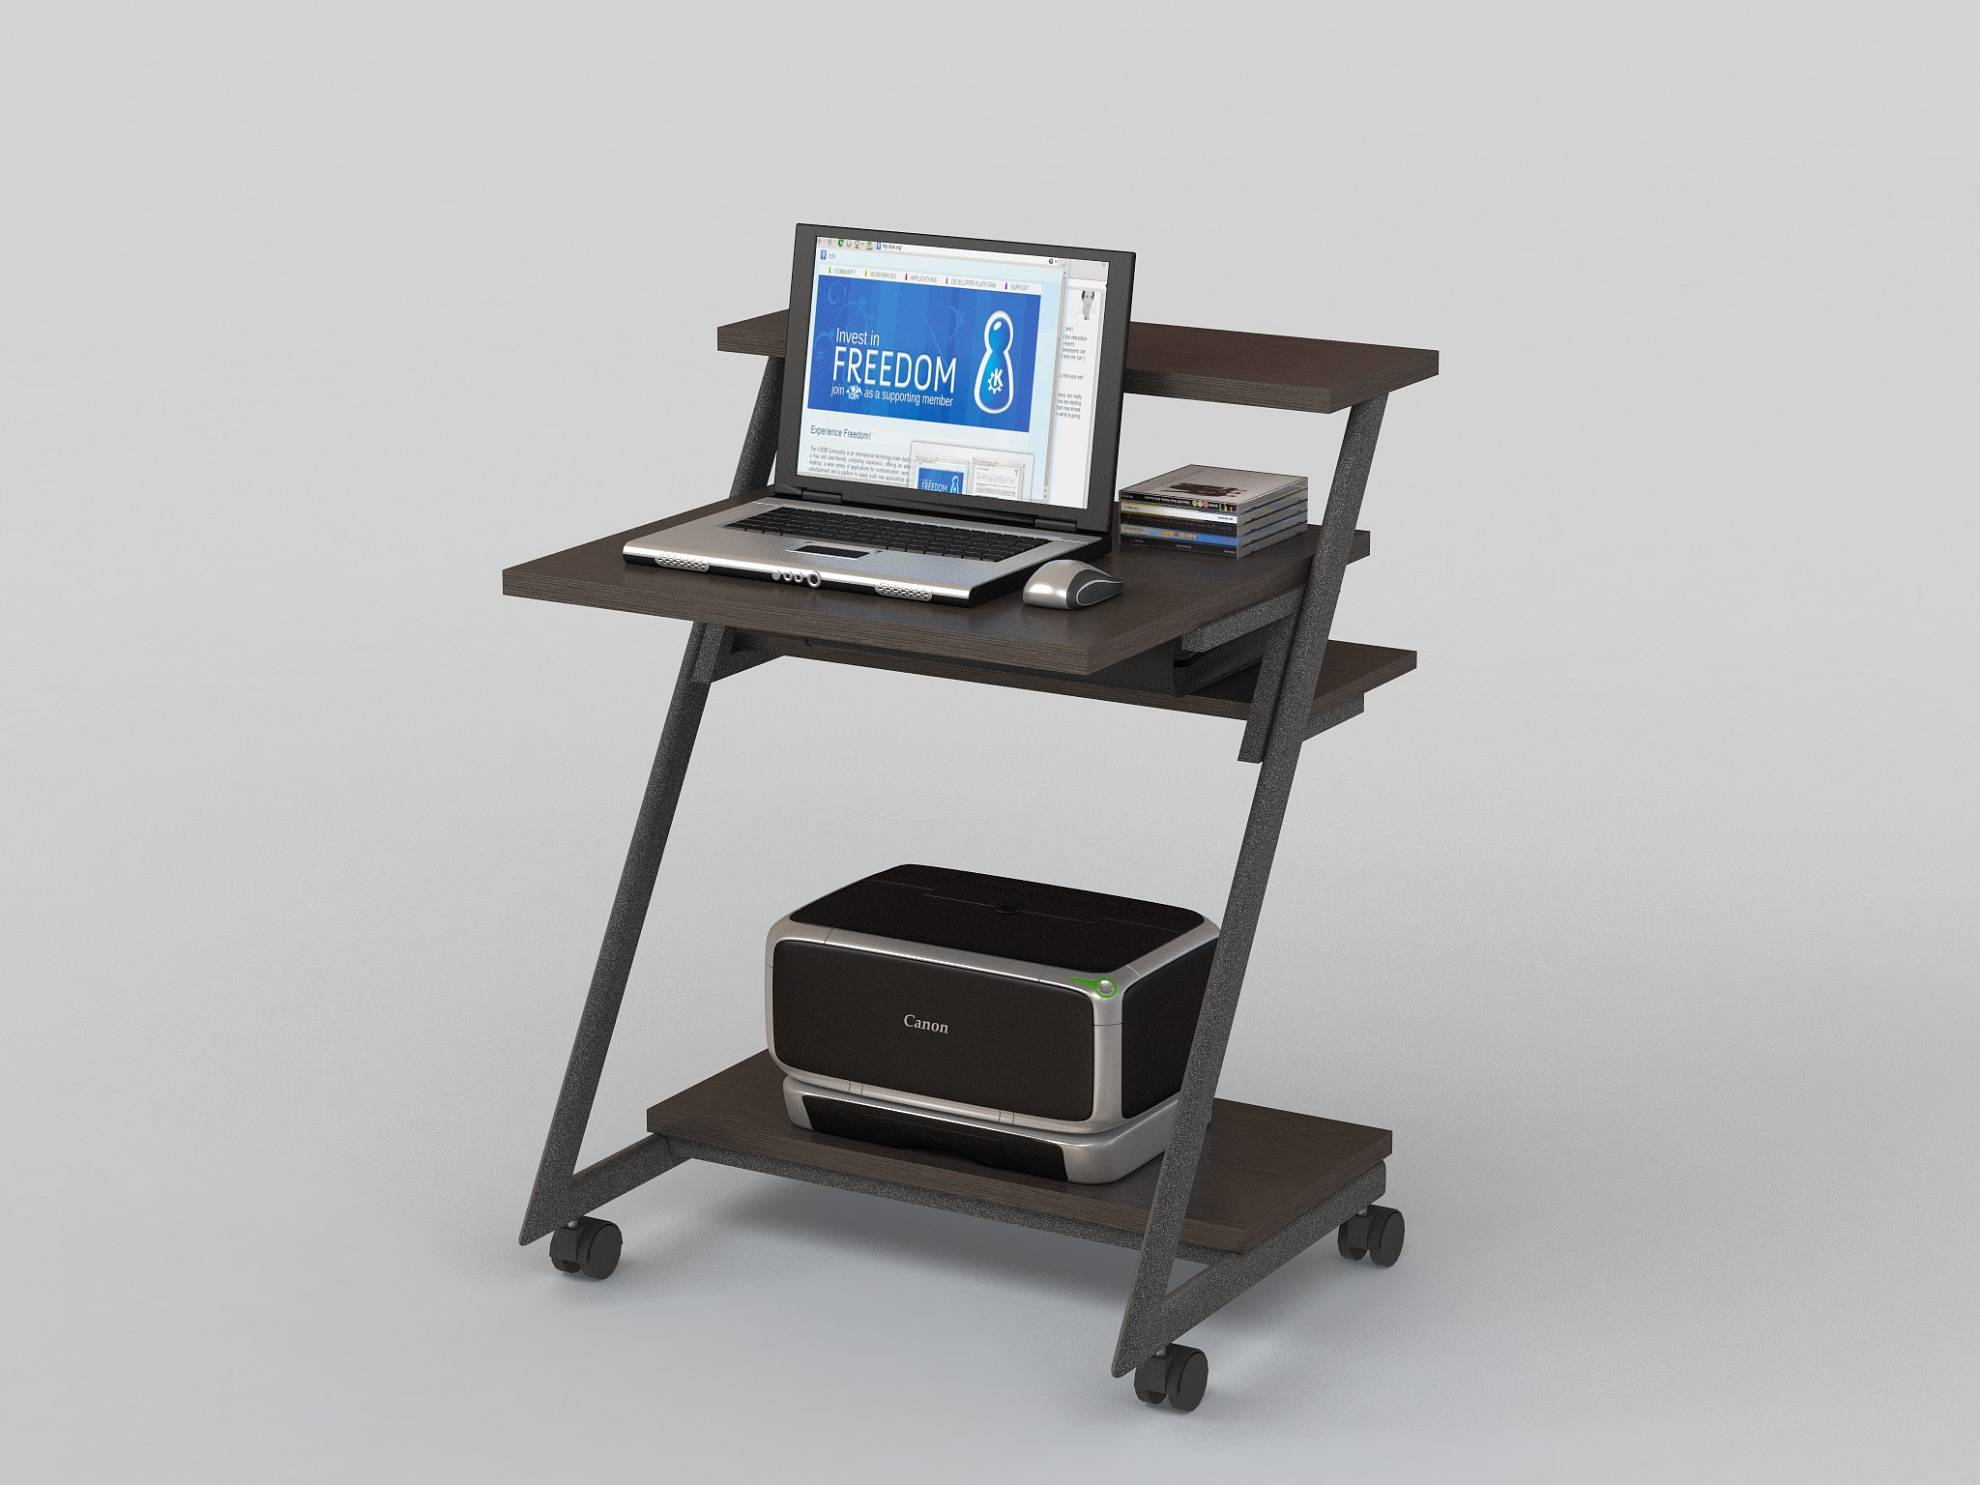 Стол для ноутбука кс 20-33 м3 купить в спб по цене производи.